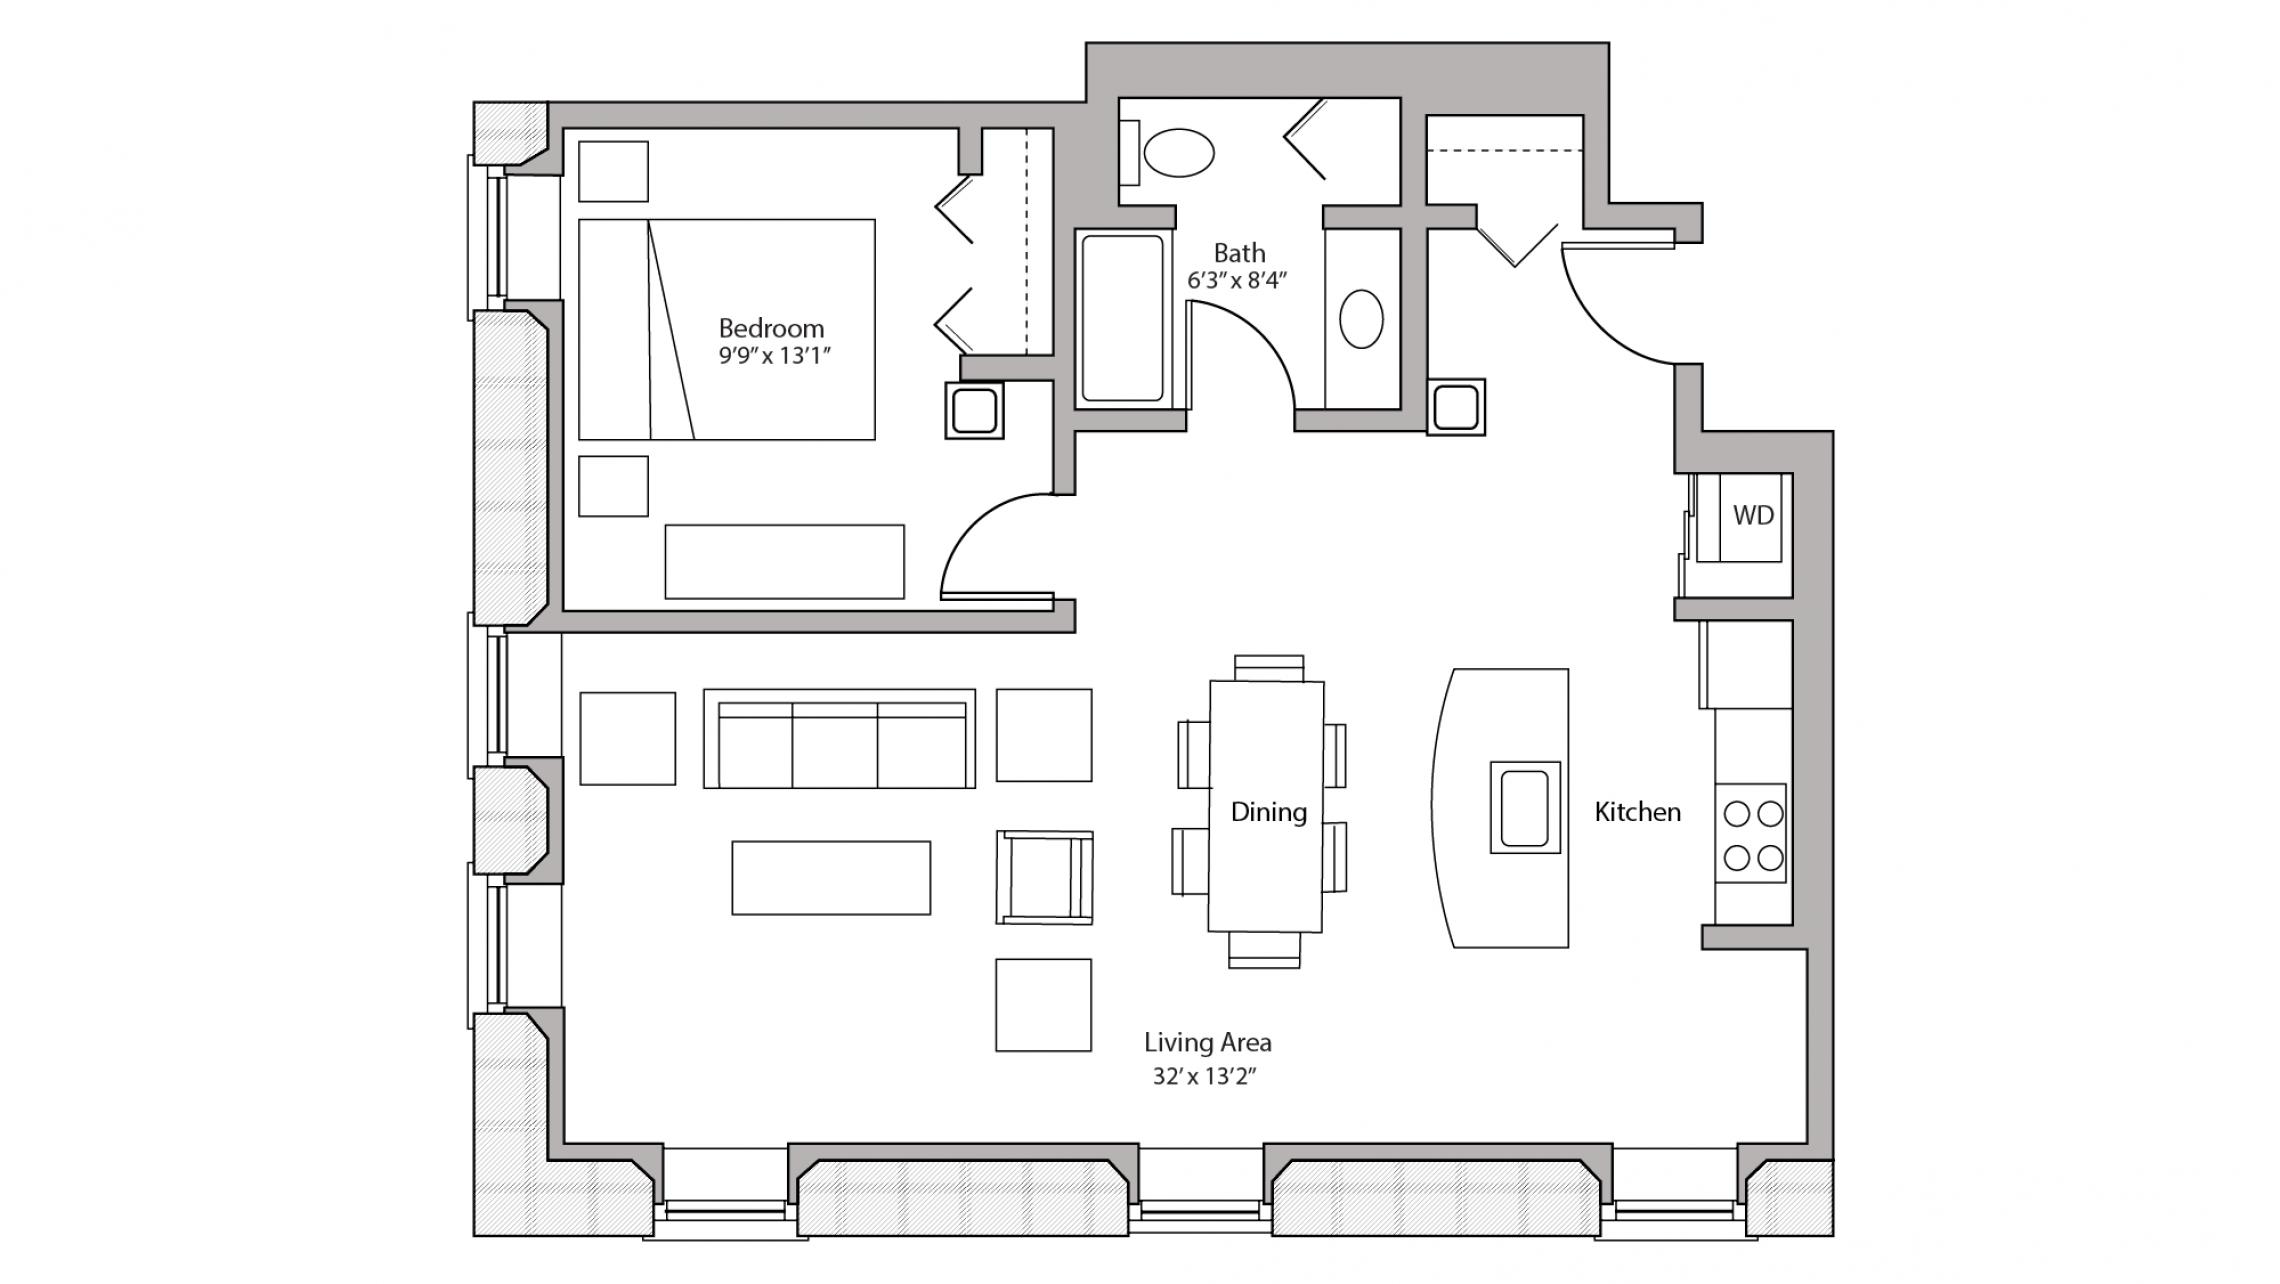 ULI Tobacco Lofts E112 - One Bedroom, One Bathroom